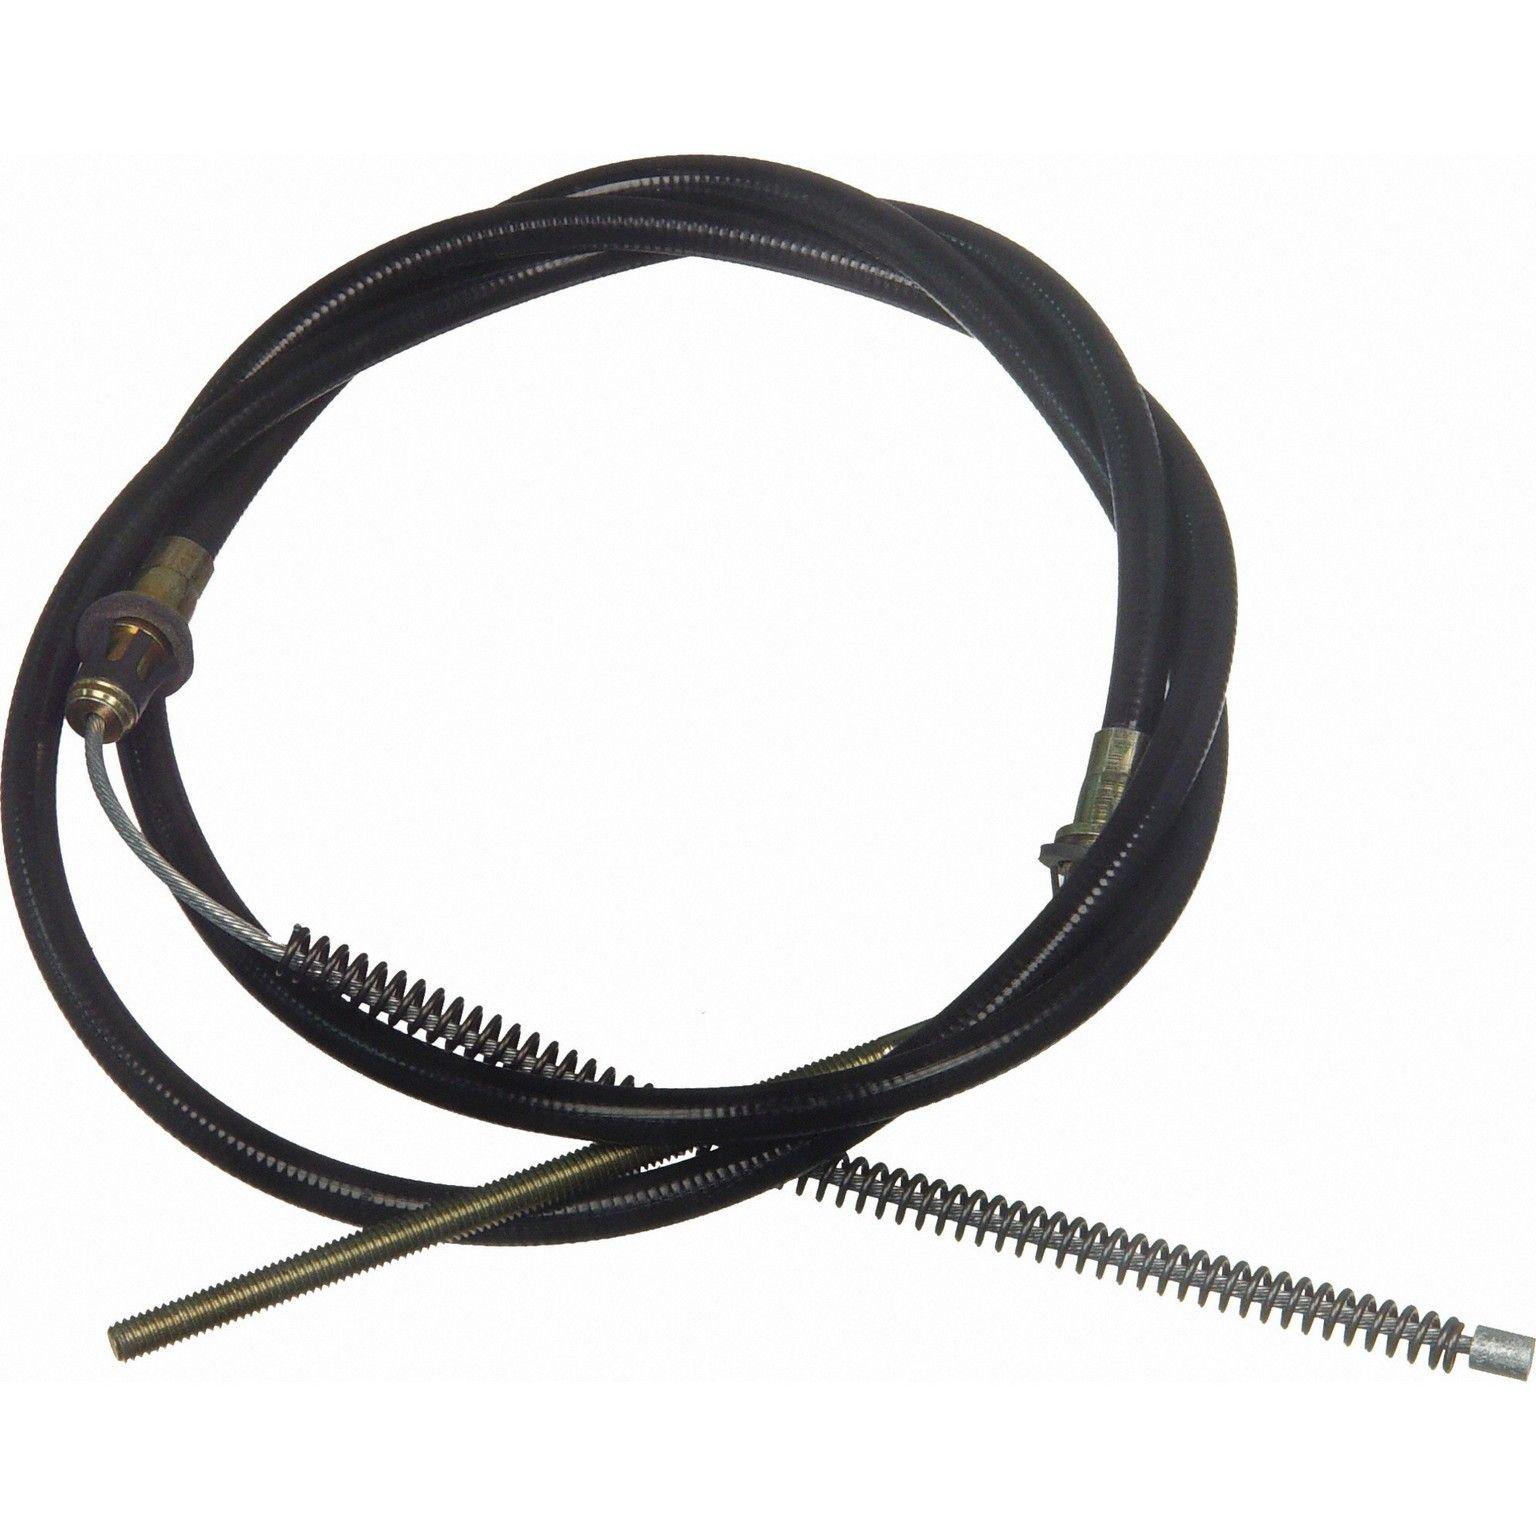 Chevrolet V30 Parking Brake Cable Replacement (Dorman